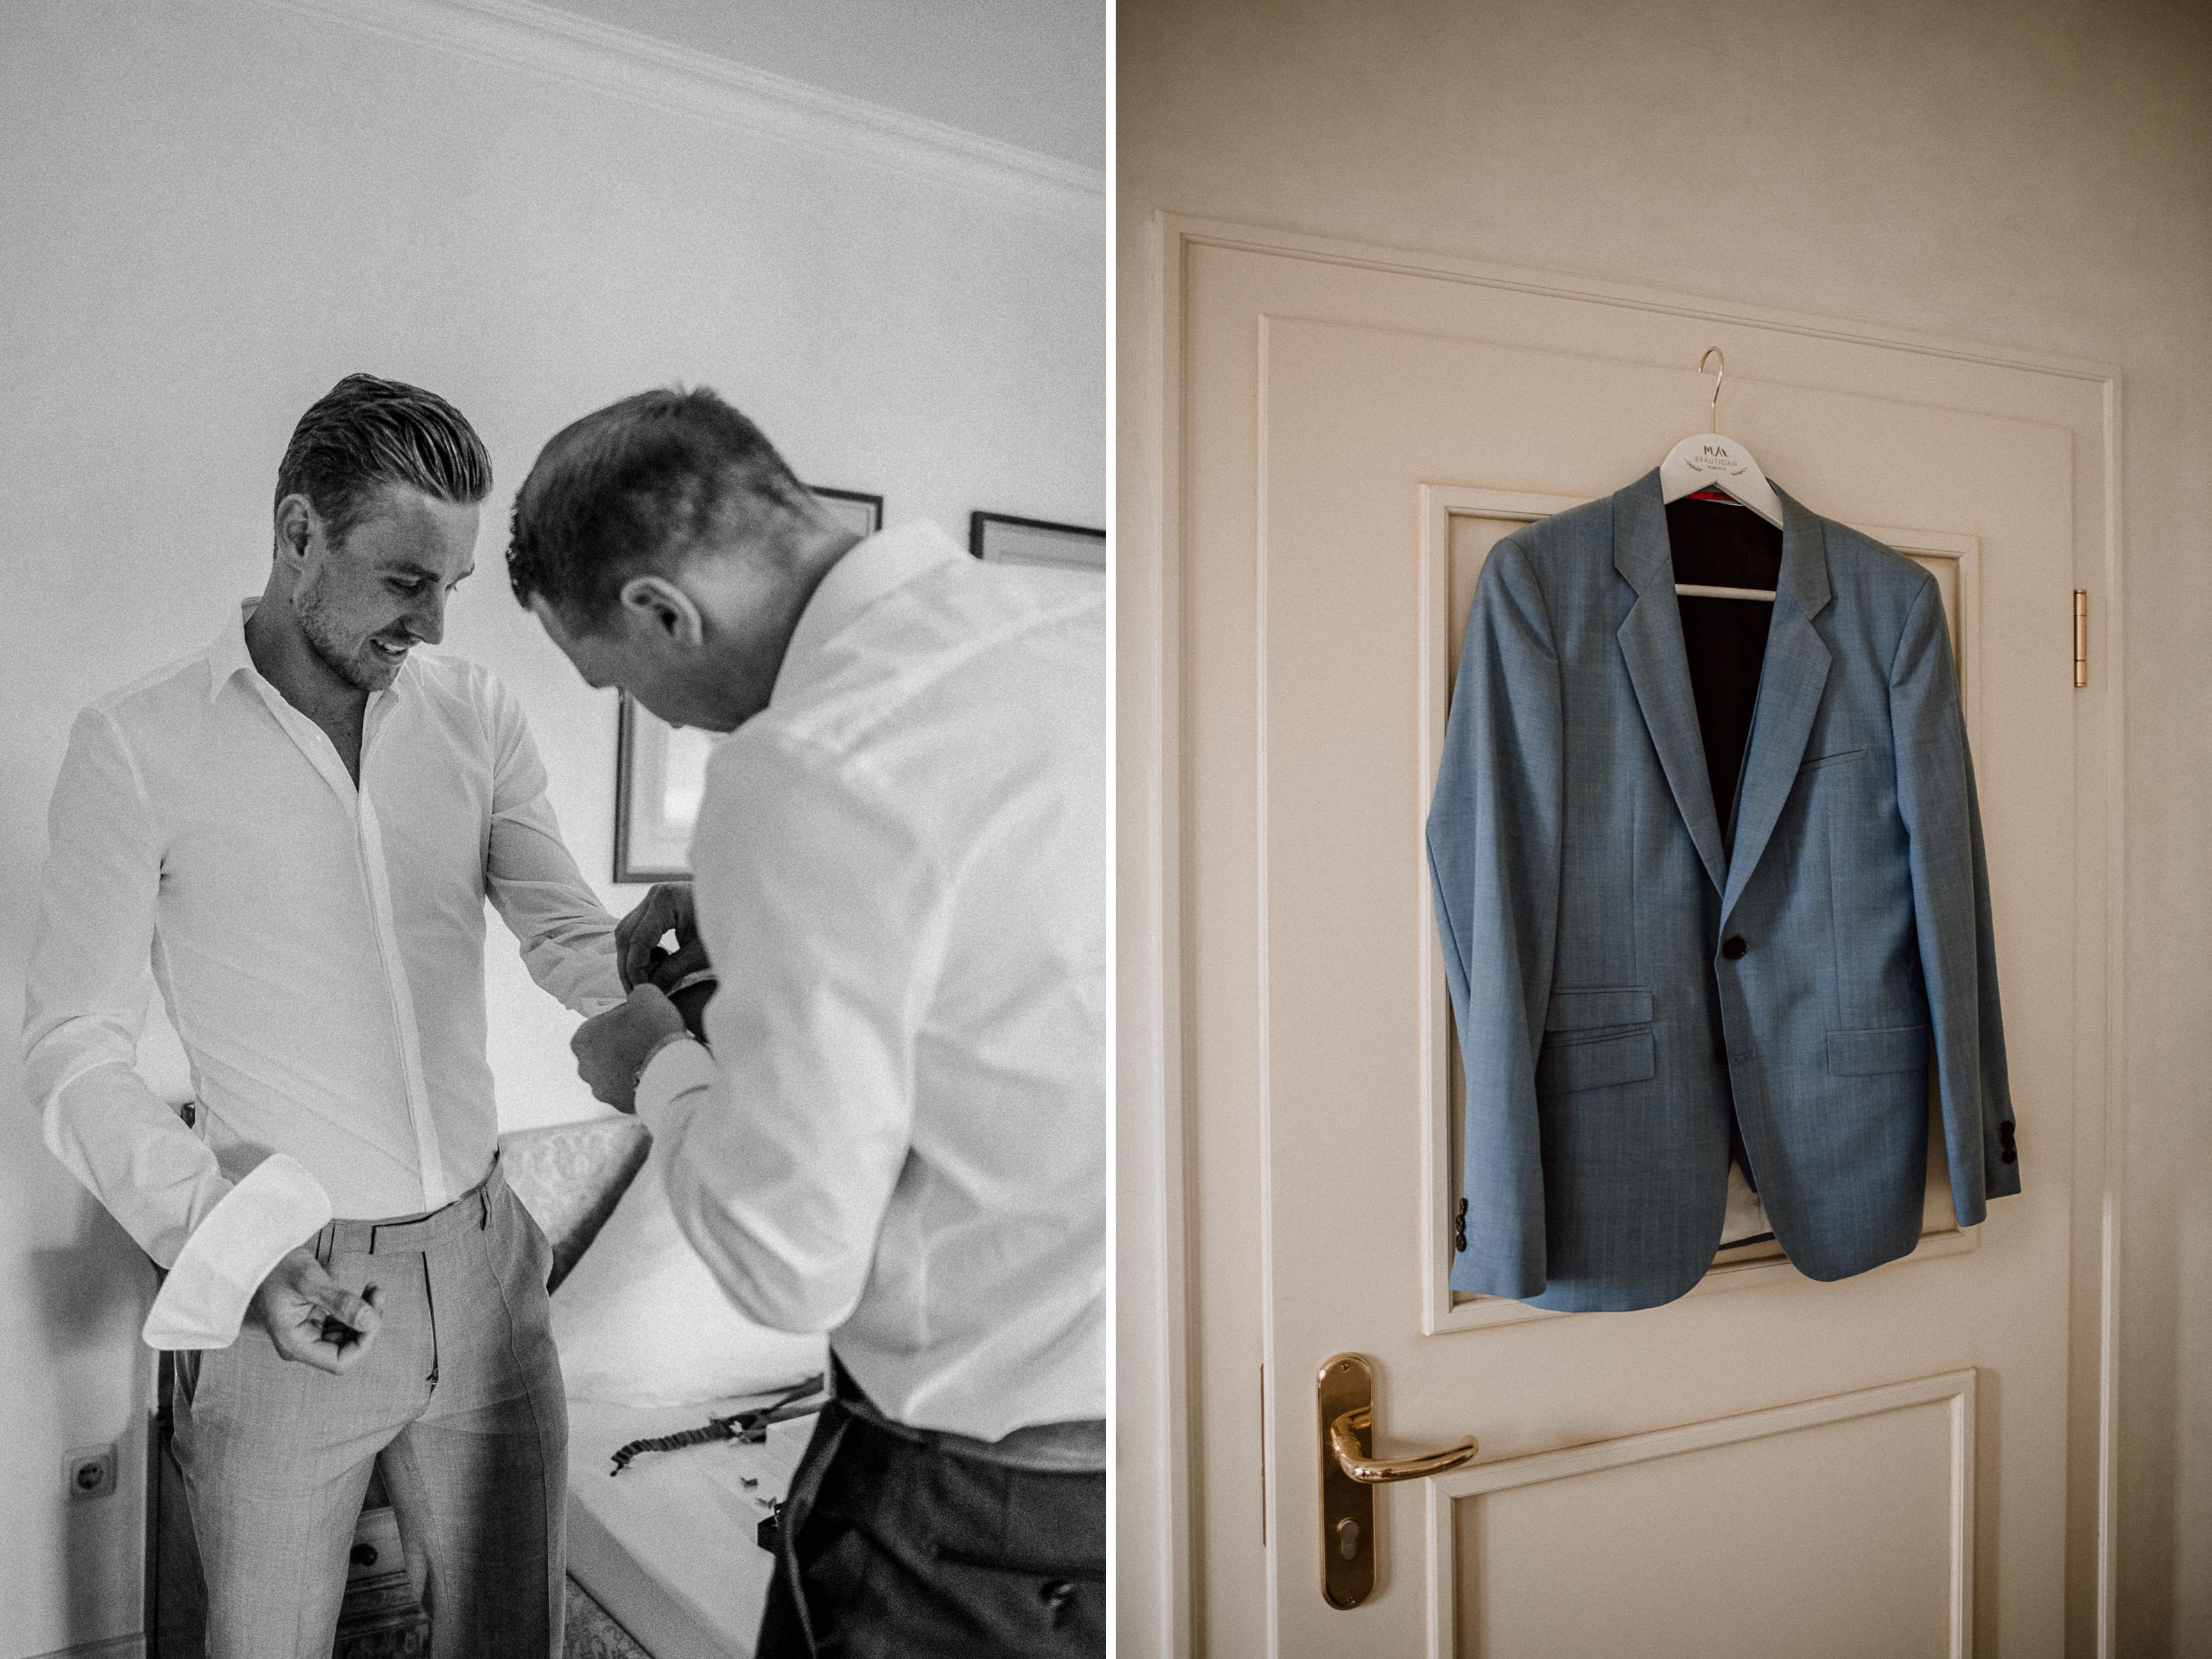 trauzeuge jacket sonja poehlmann photography couples muenchen bayern